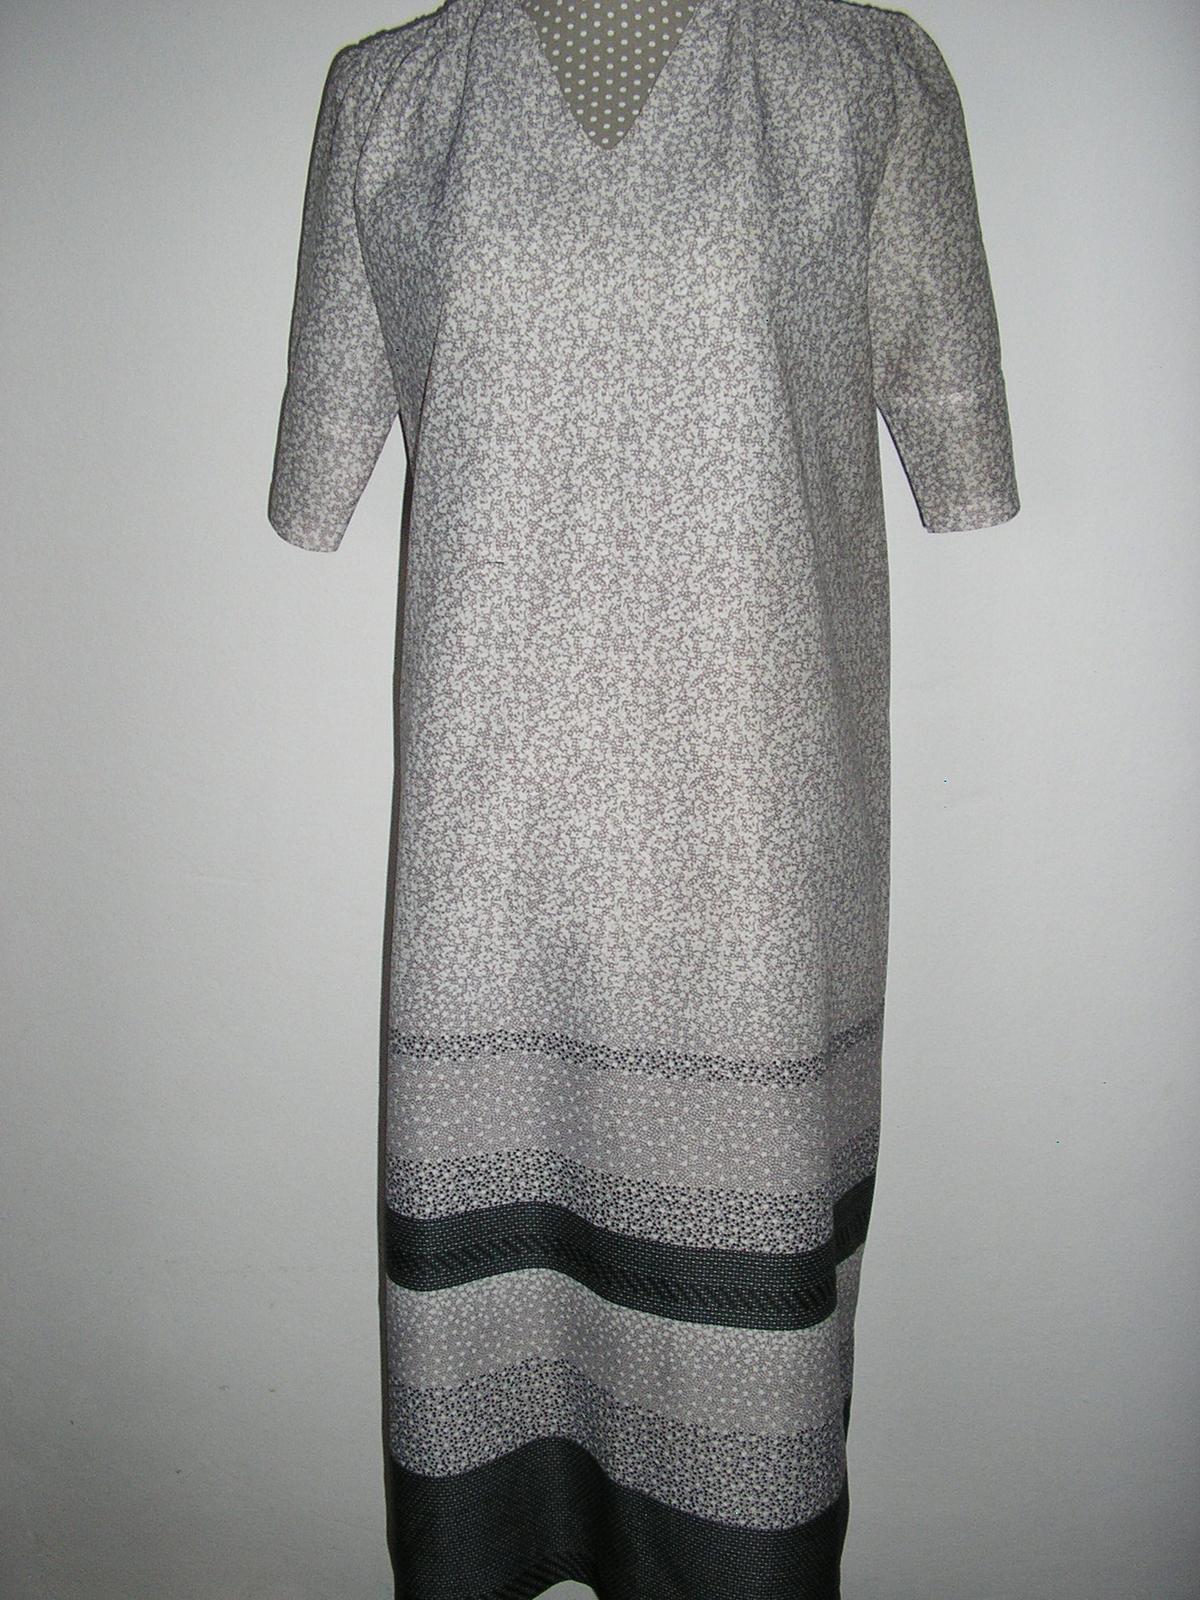 1005 Šaty  - Obrázok č. 1